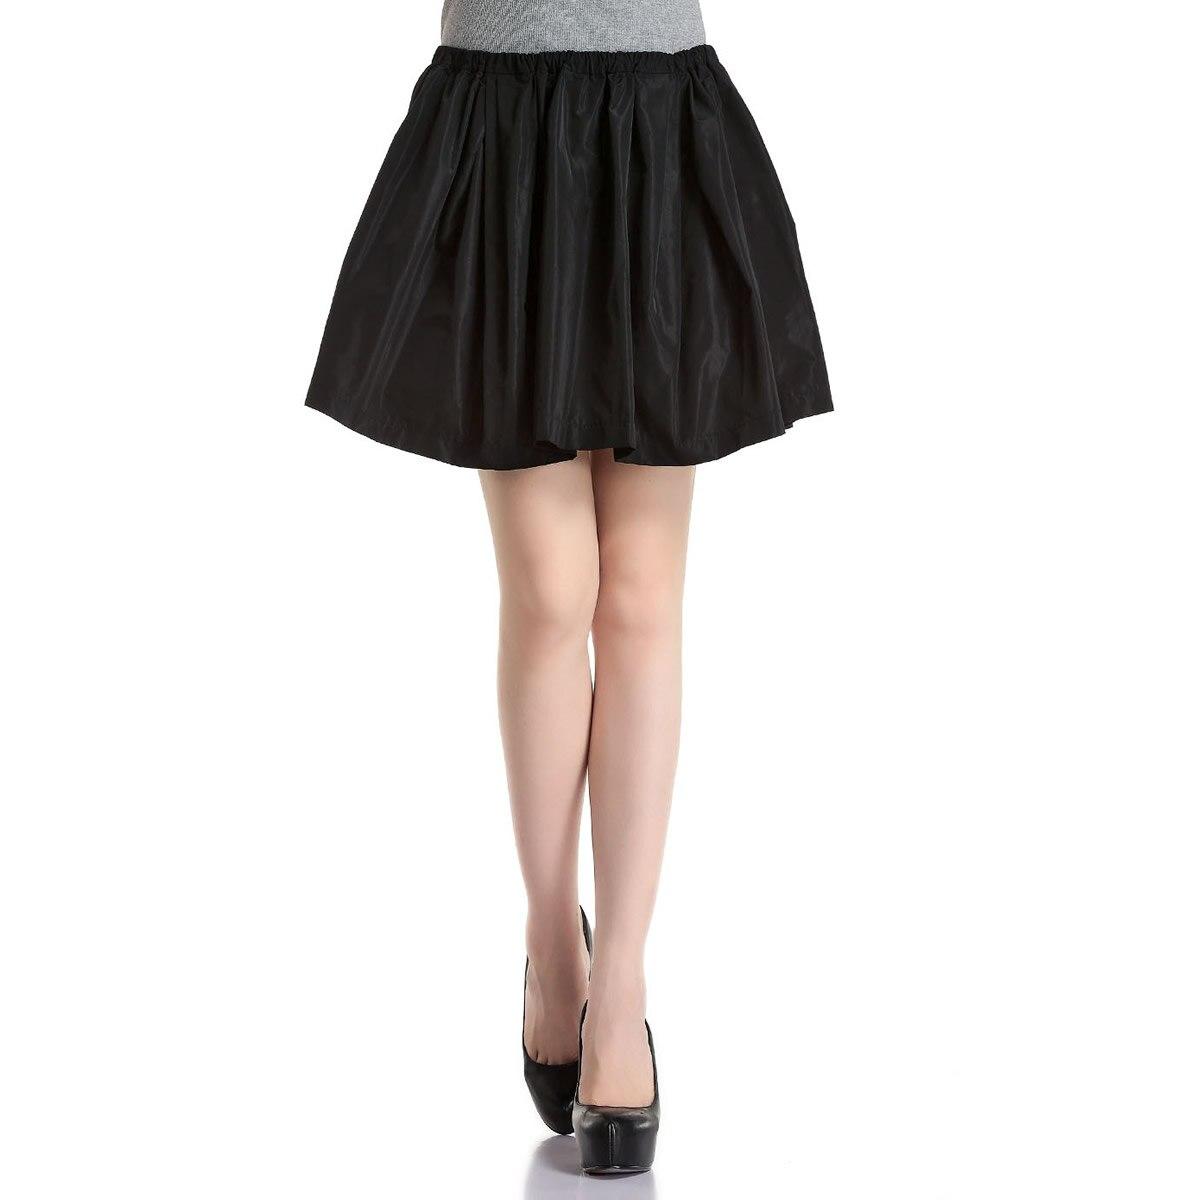 Размер юбки 24